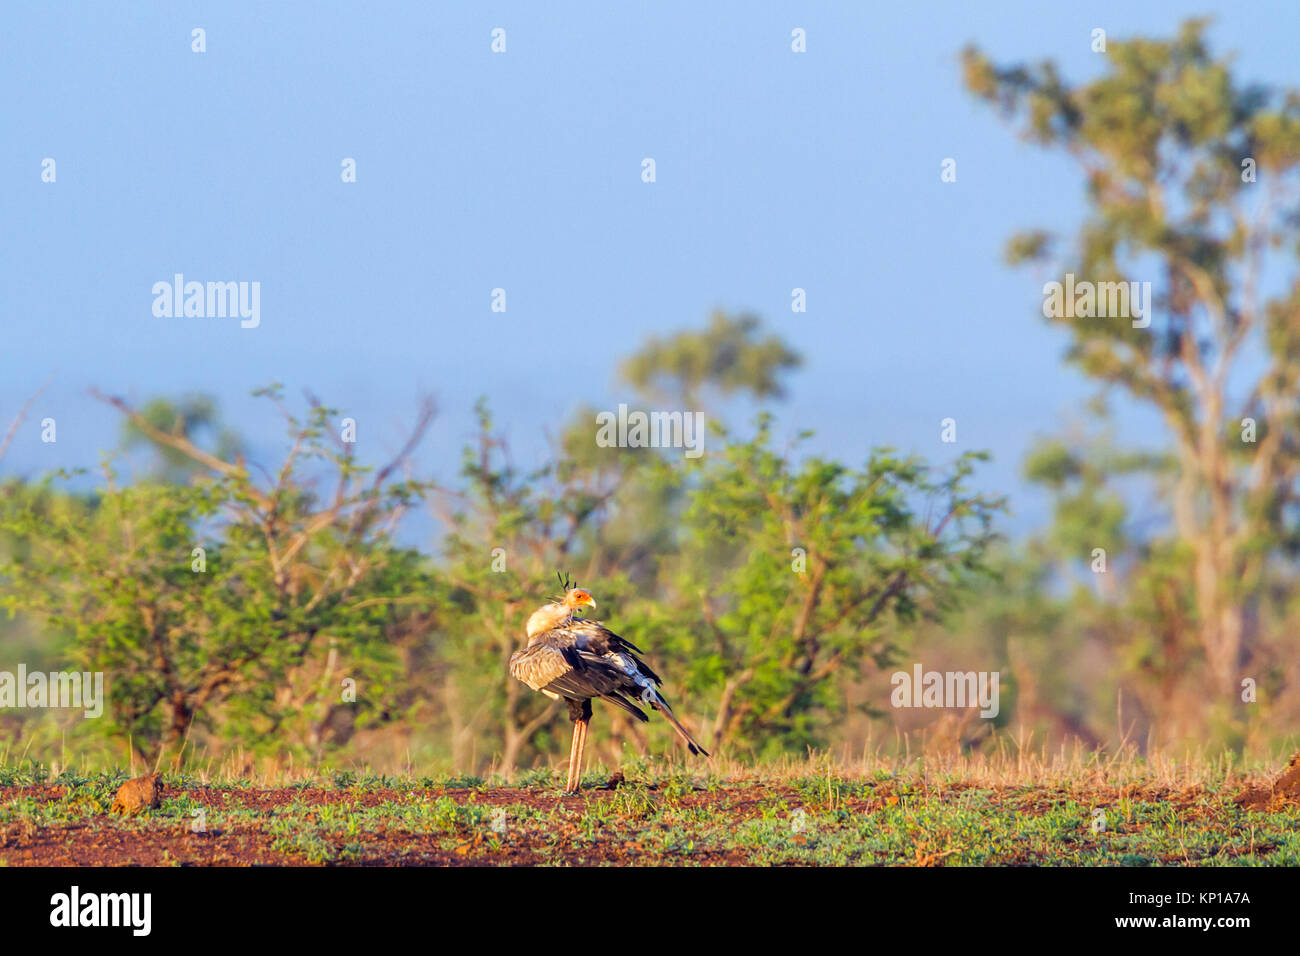 Secretary bird in Kruger national park, South Africa ; Specie Sagittarius serpentarius family of Sagittariidae Stock Photo